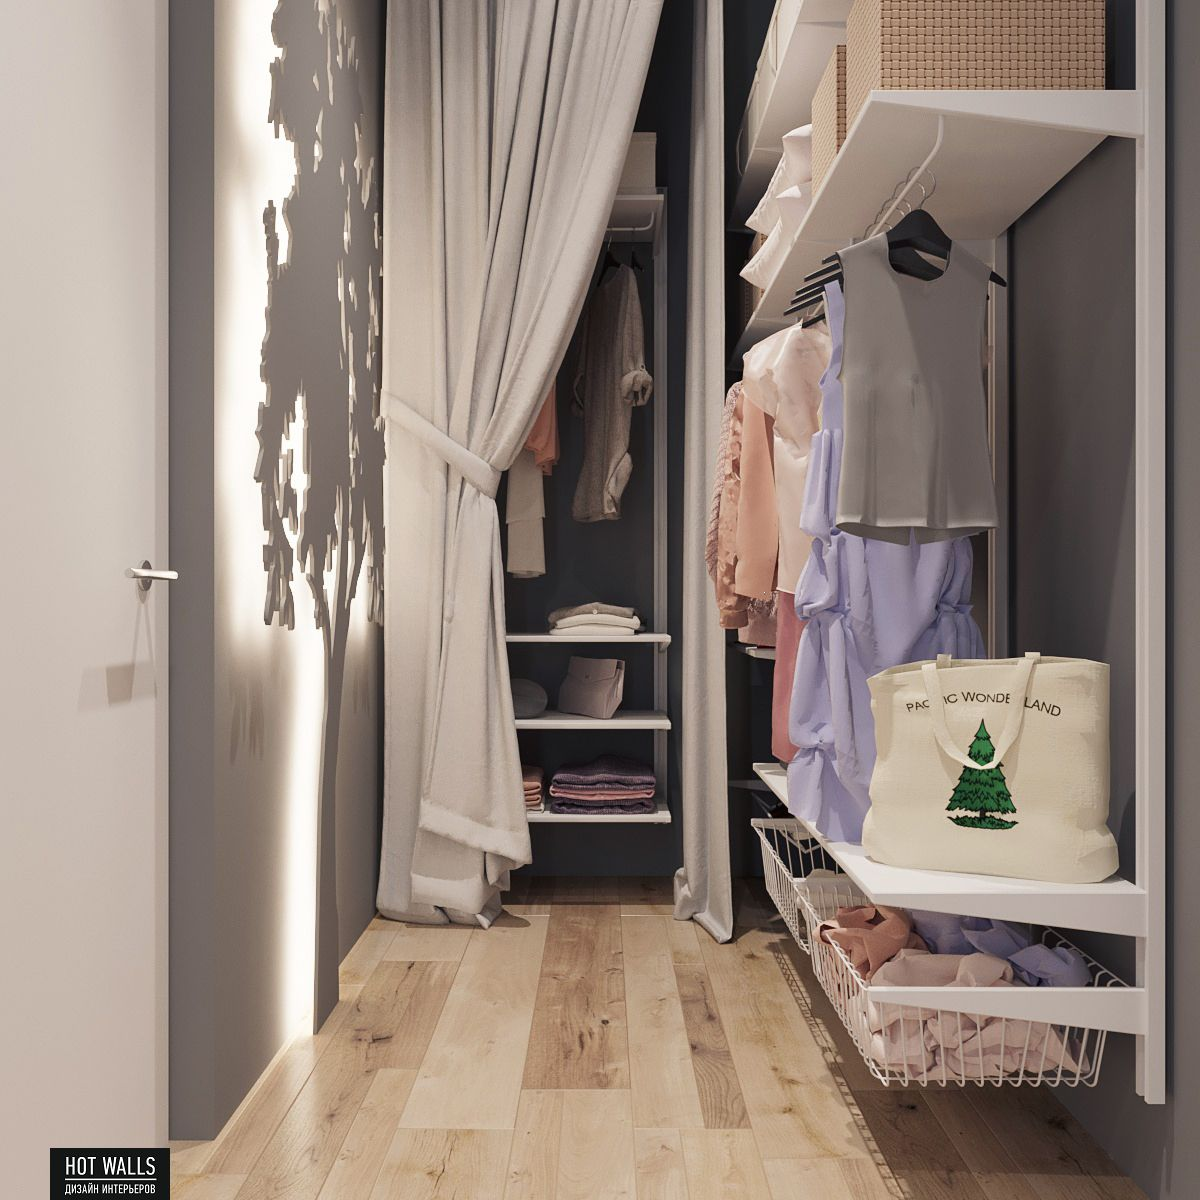 Wardrobe_28.10.17_2